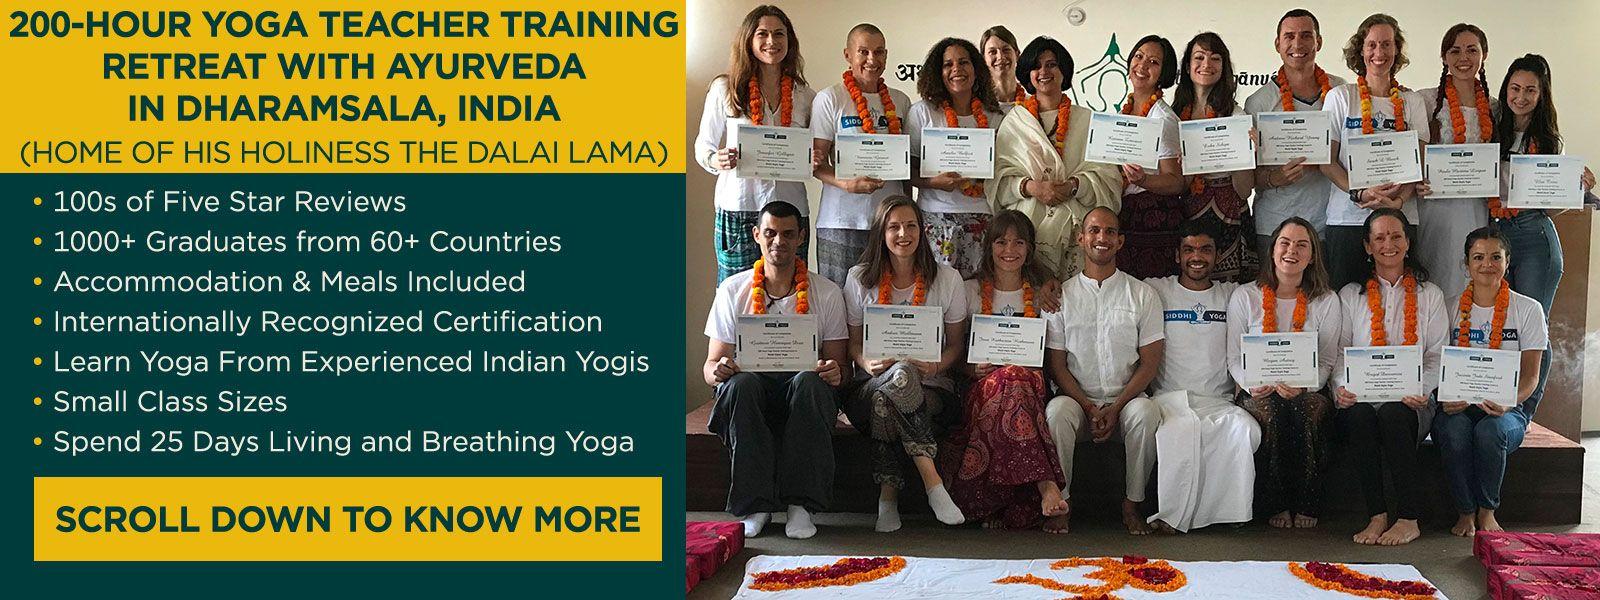 yoga teacher training india 2018